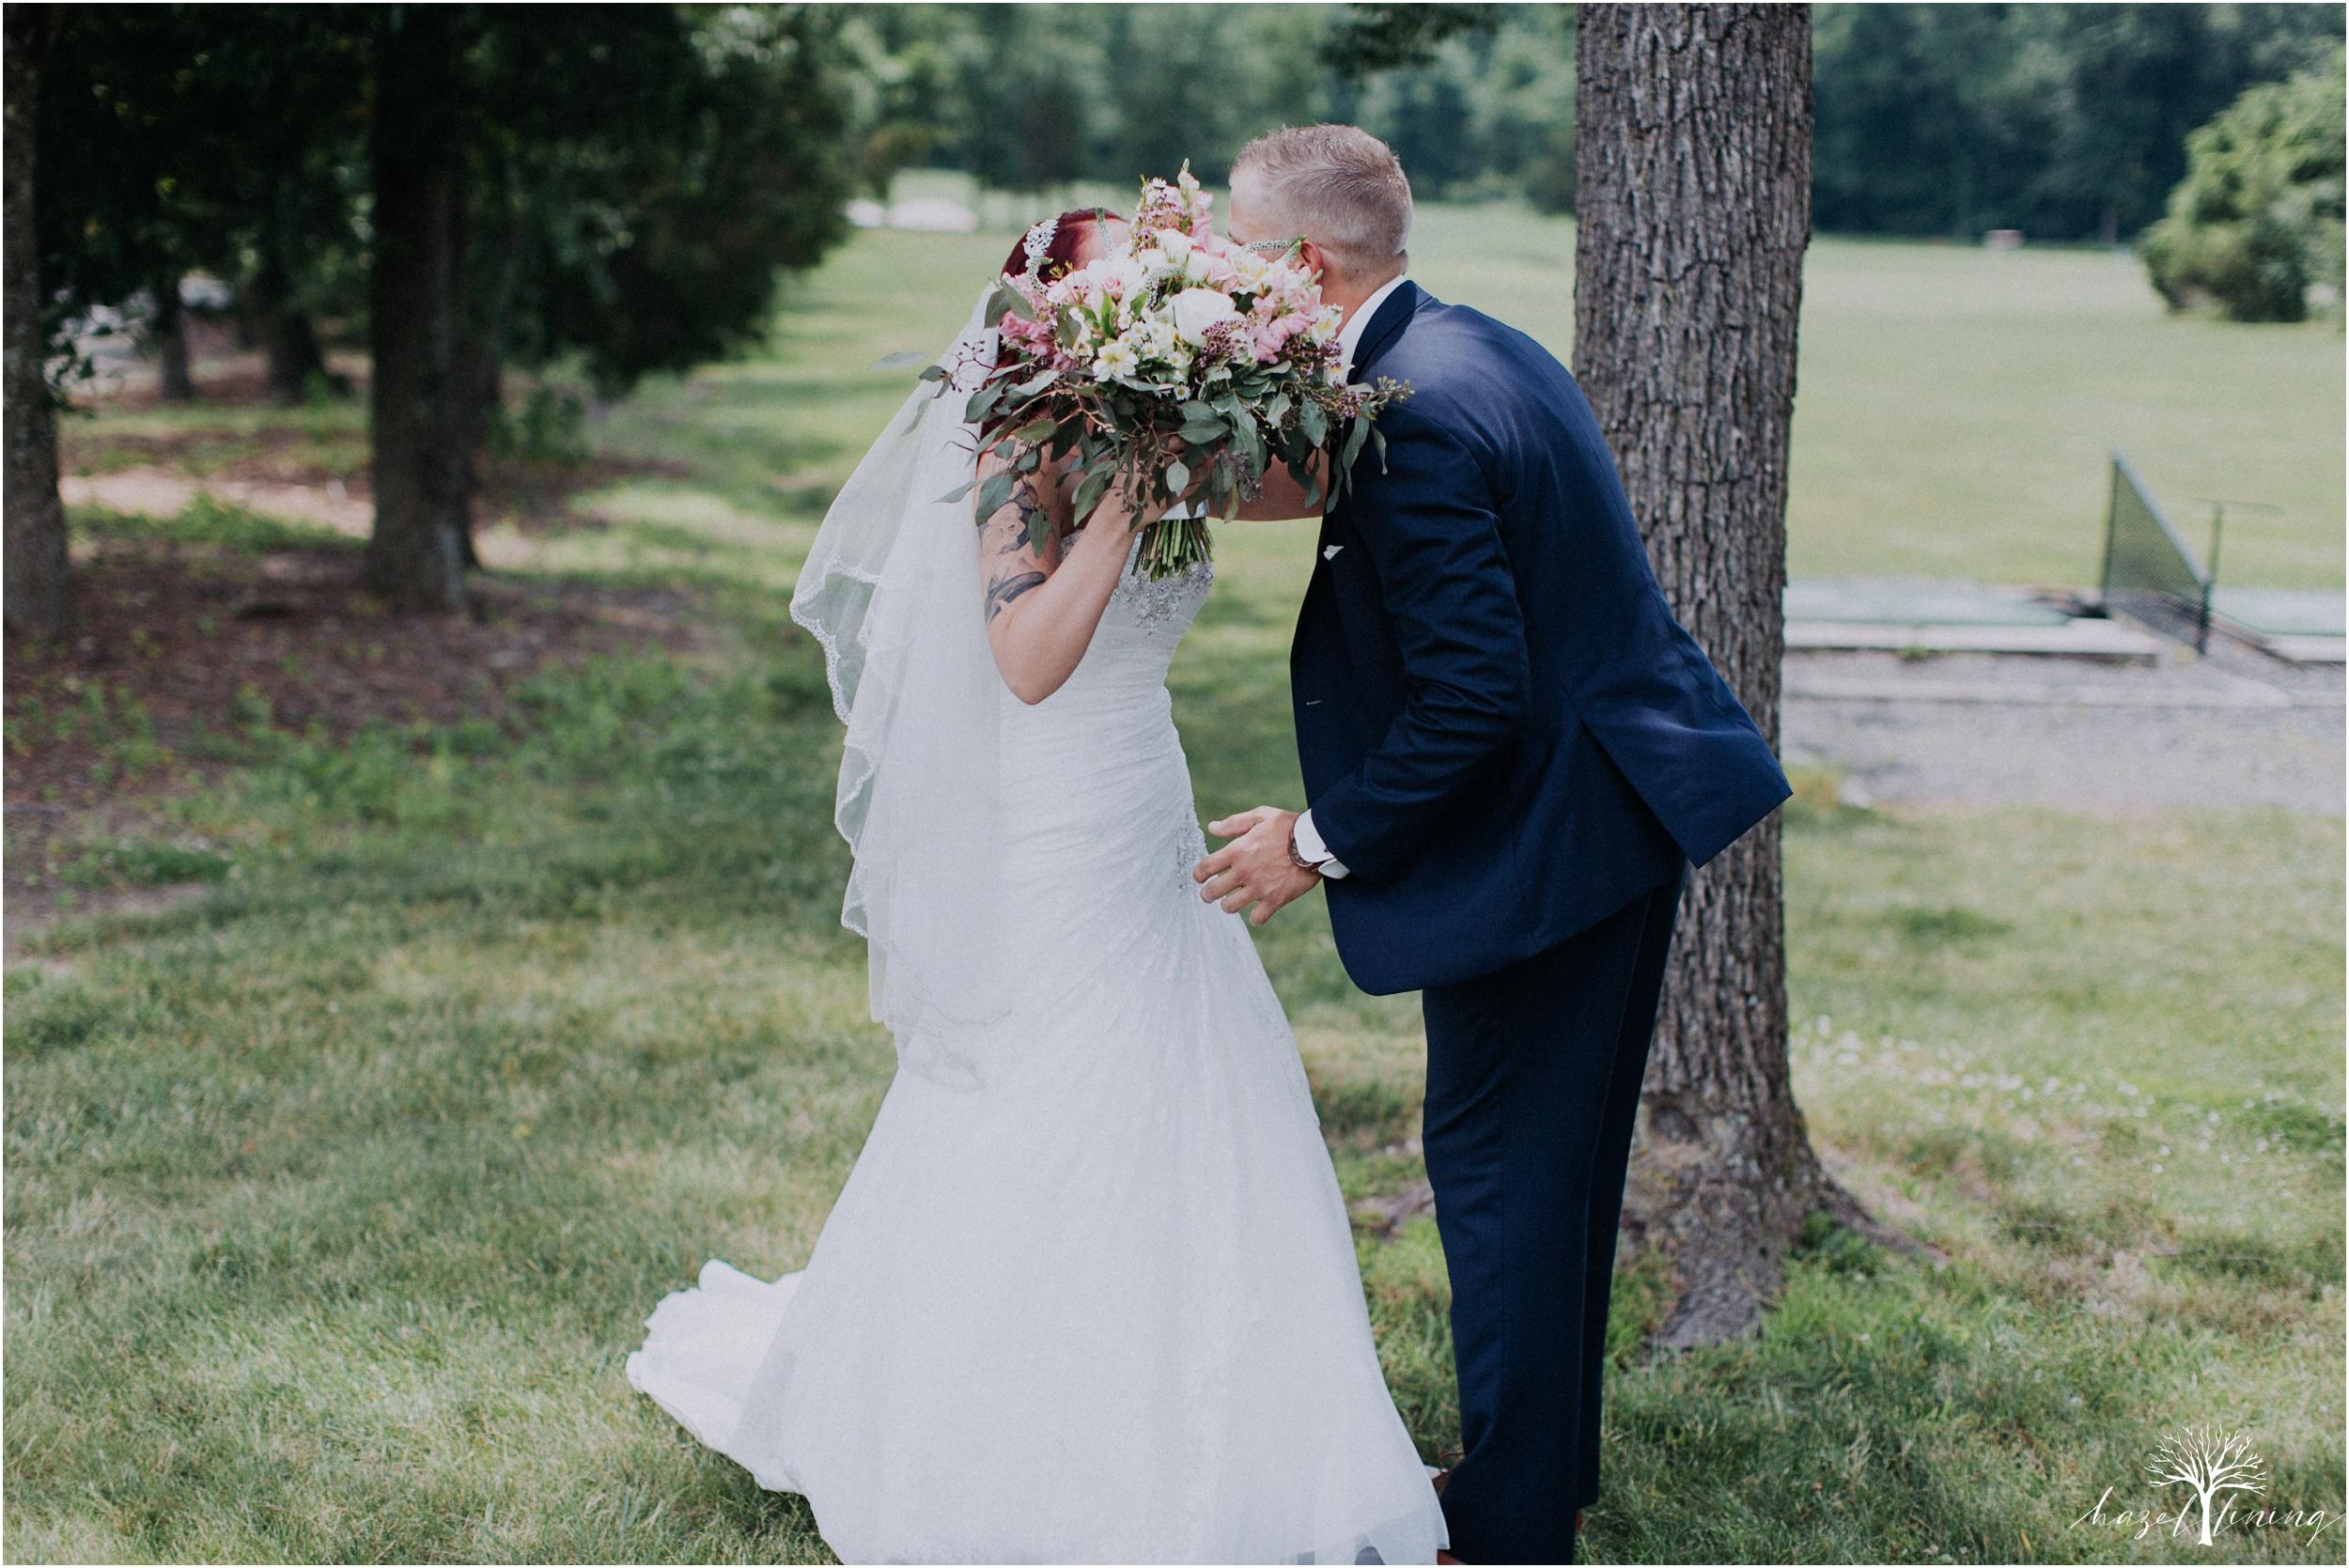 alyssa-james-stiteler-wedding-loft-and-sweet-water-cc-pennsburg-pennsylvania-hazel-lining-travel-wedding-elopement-photography_0028.jpg